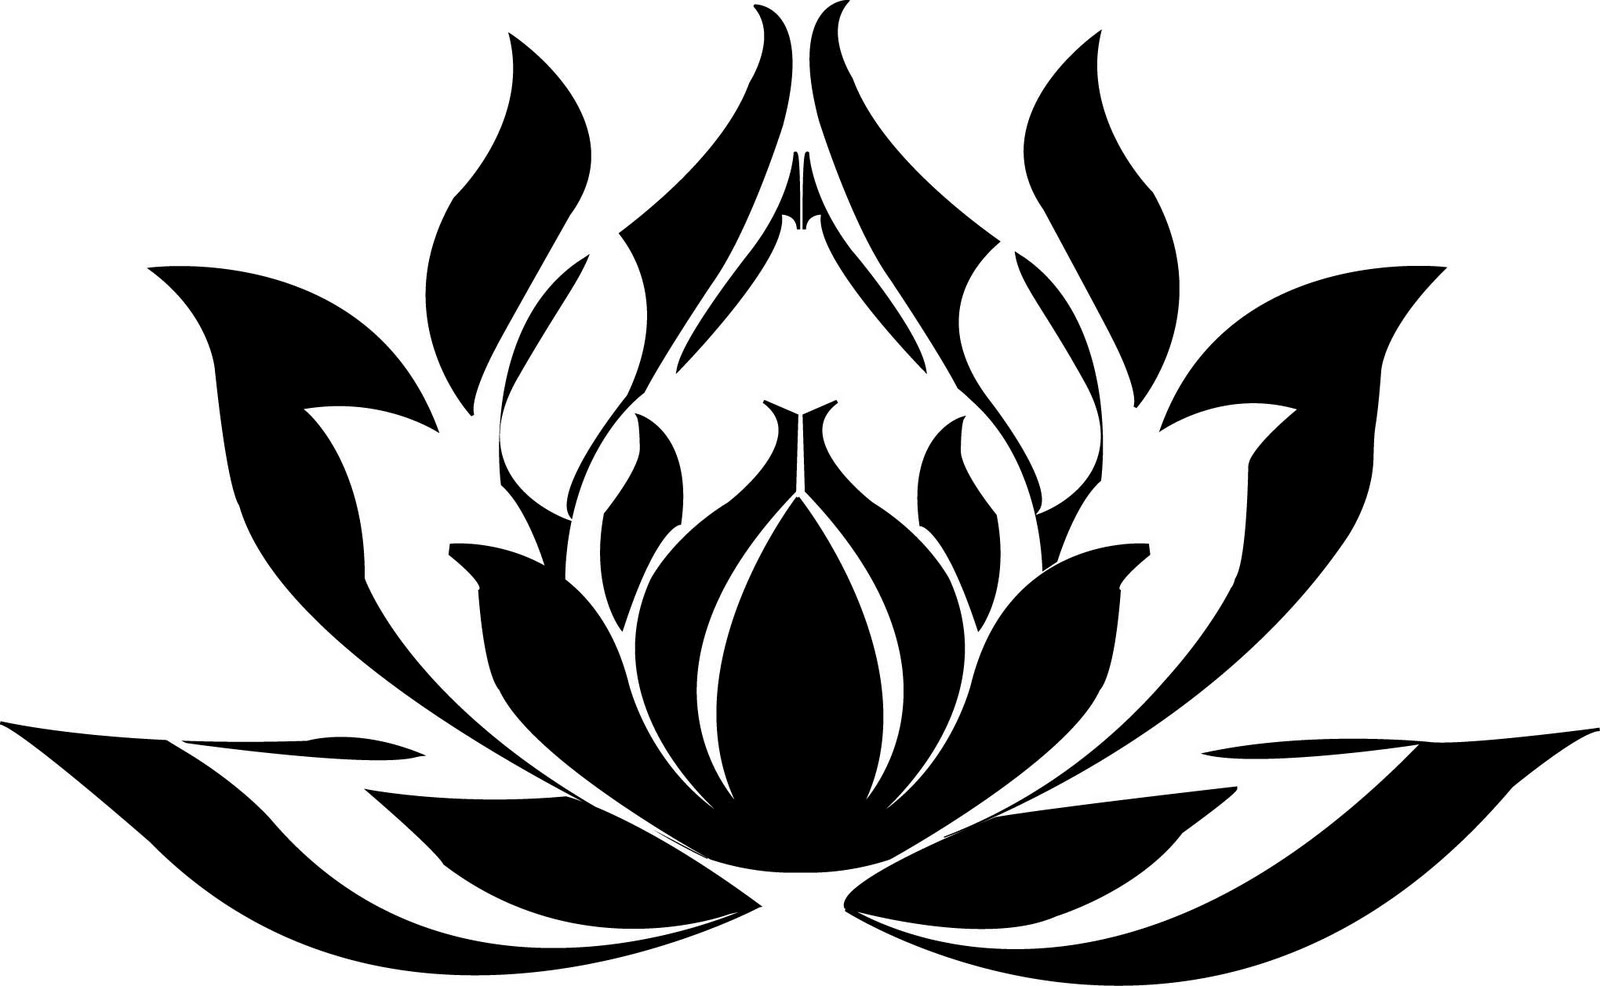 Image Zalian Symbolg Stargate Renaissance Wiki Fandom